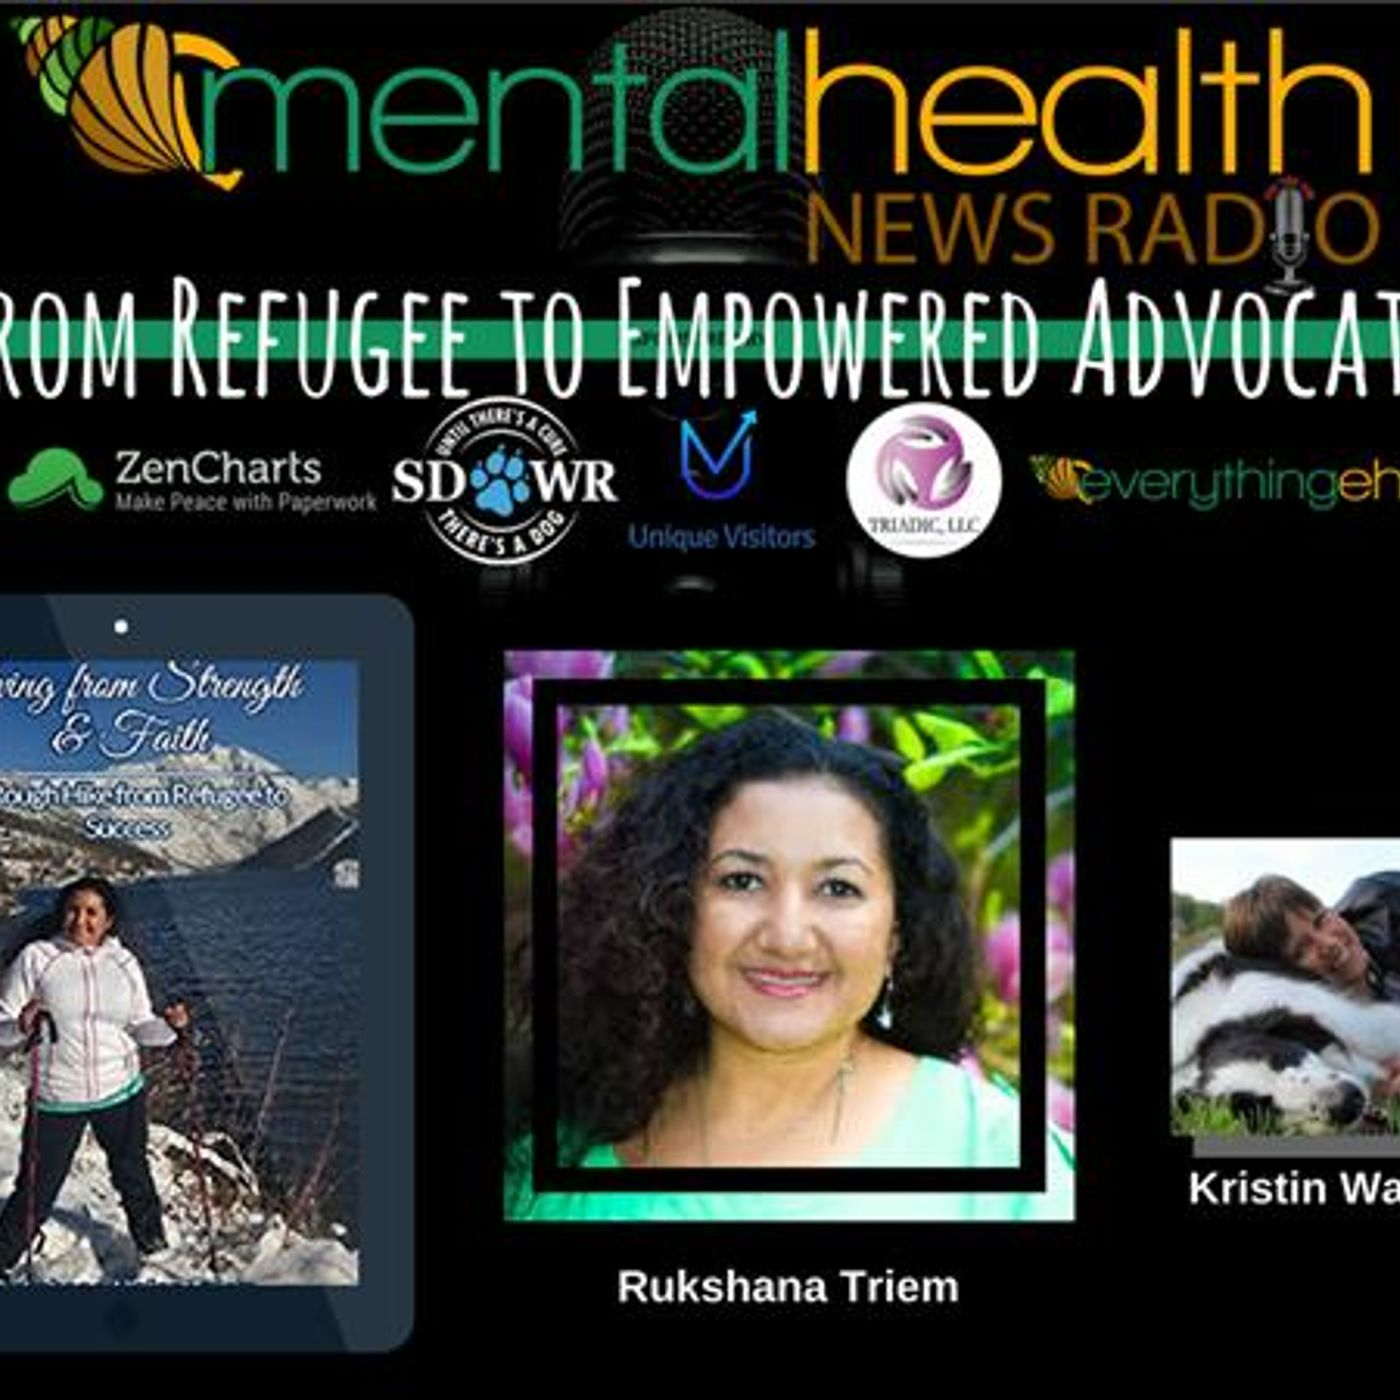 Mental Health News Radio - From Refugee to Empowered Advocate: Rukshana Triem